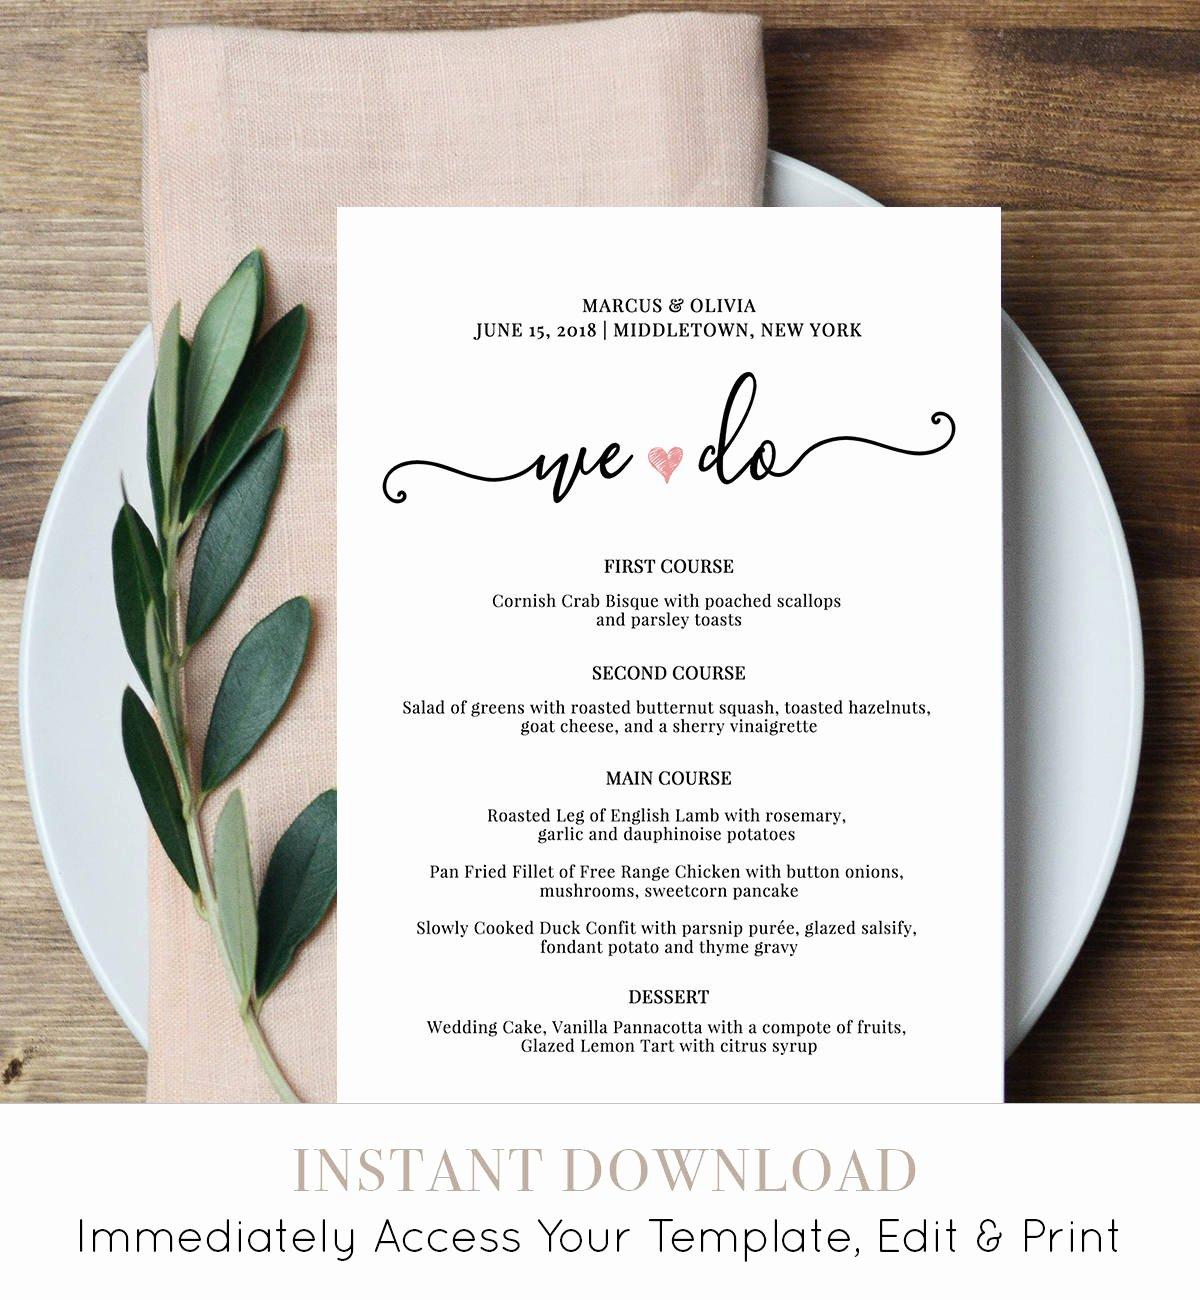 Wedding Menu Card Template New Wedding Menu Card Template We Do Printable Dinner Menu